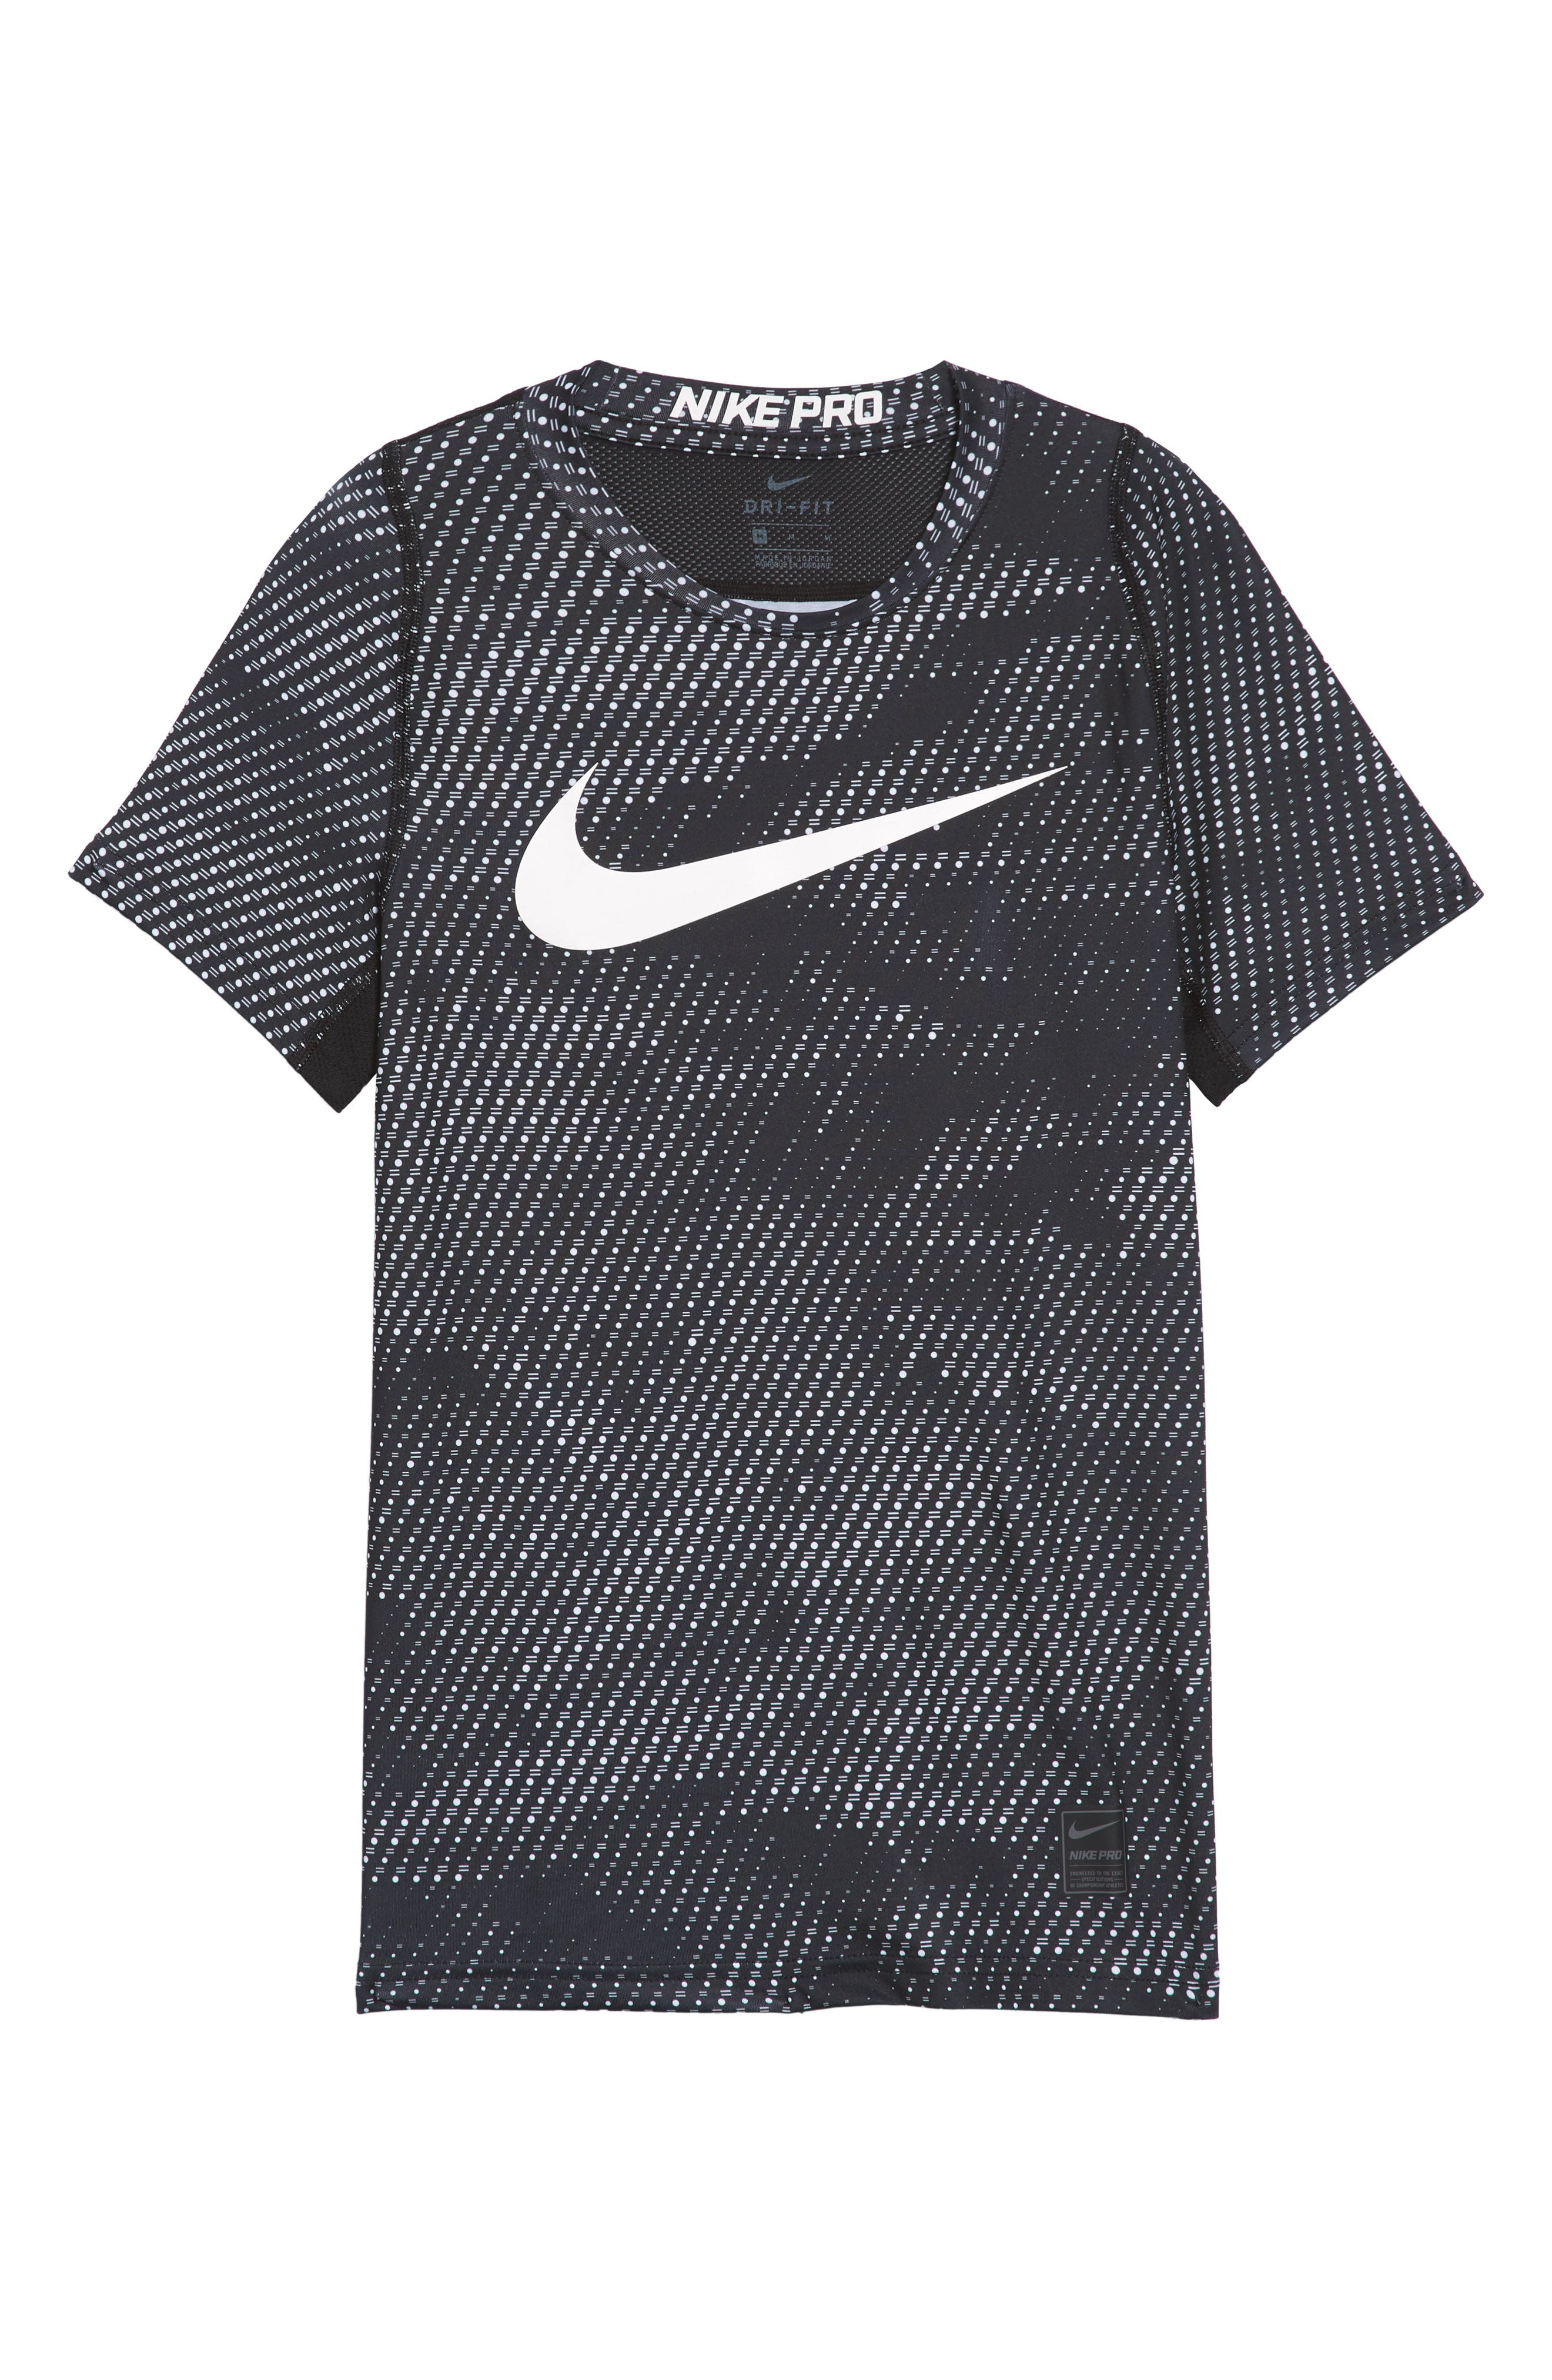 Pro Graphic Shirt,                         Main,                         color, 010